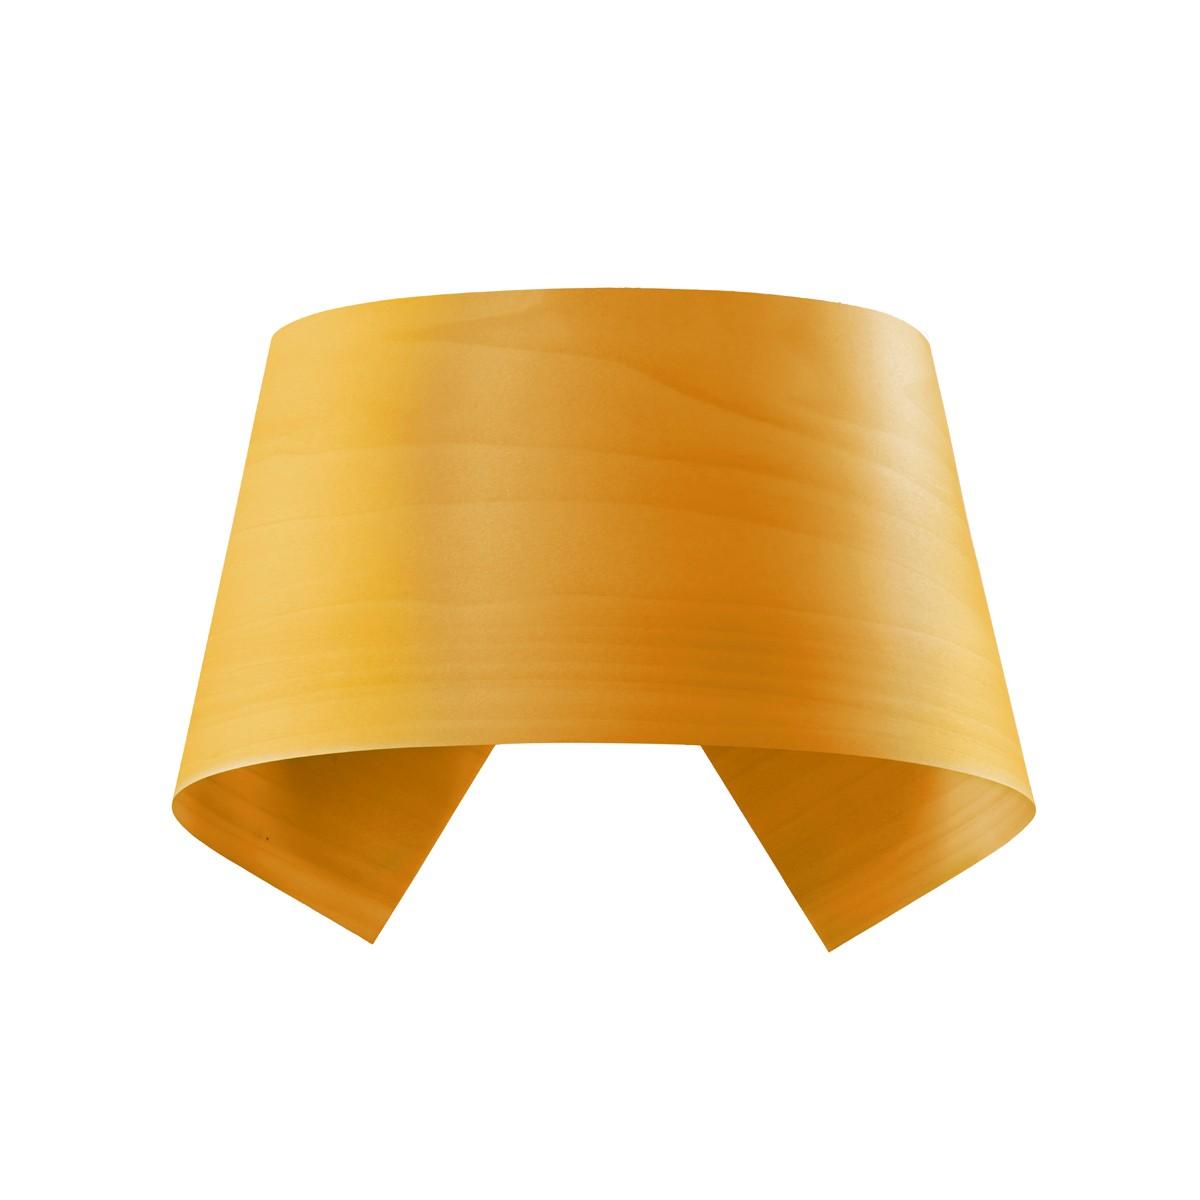 LZF Lamps Hi-Collar LED Wandleuchte, gelb